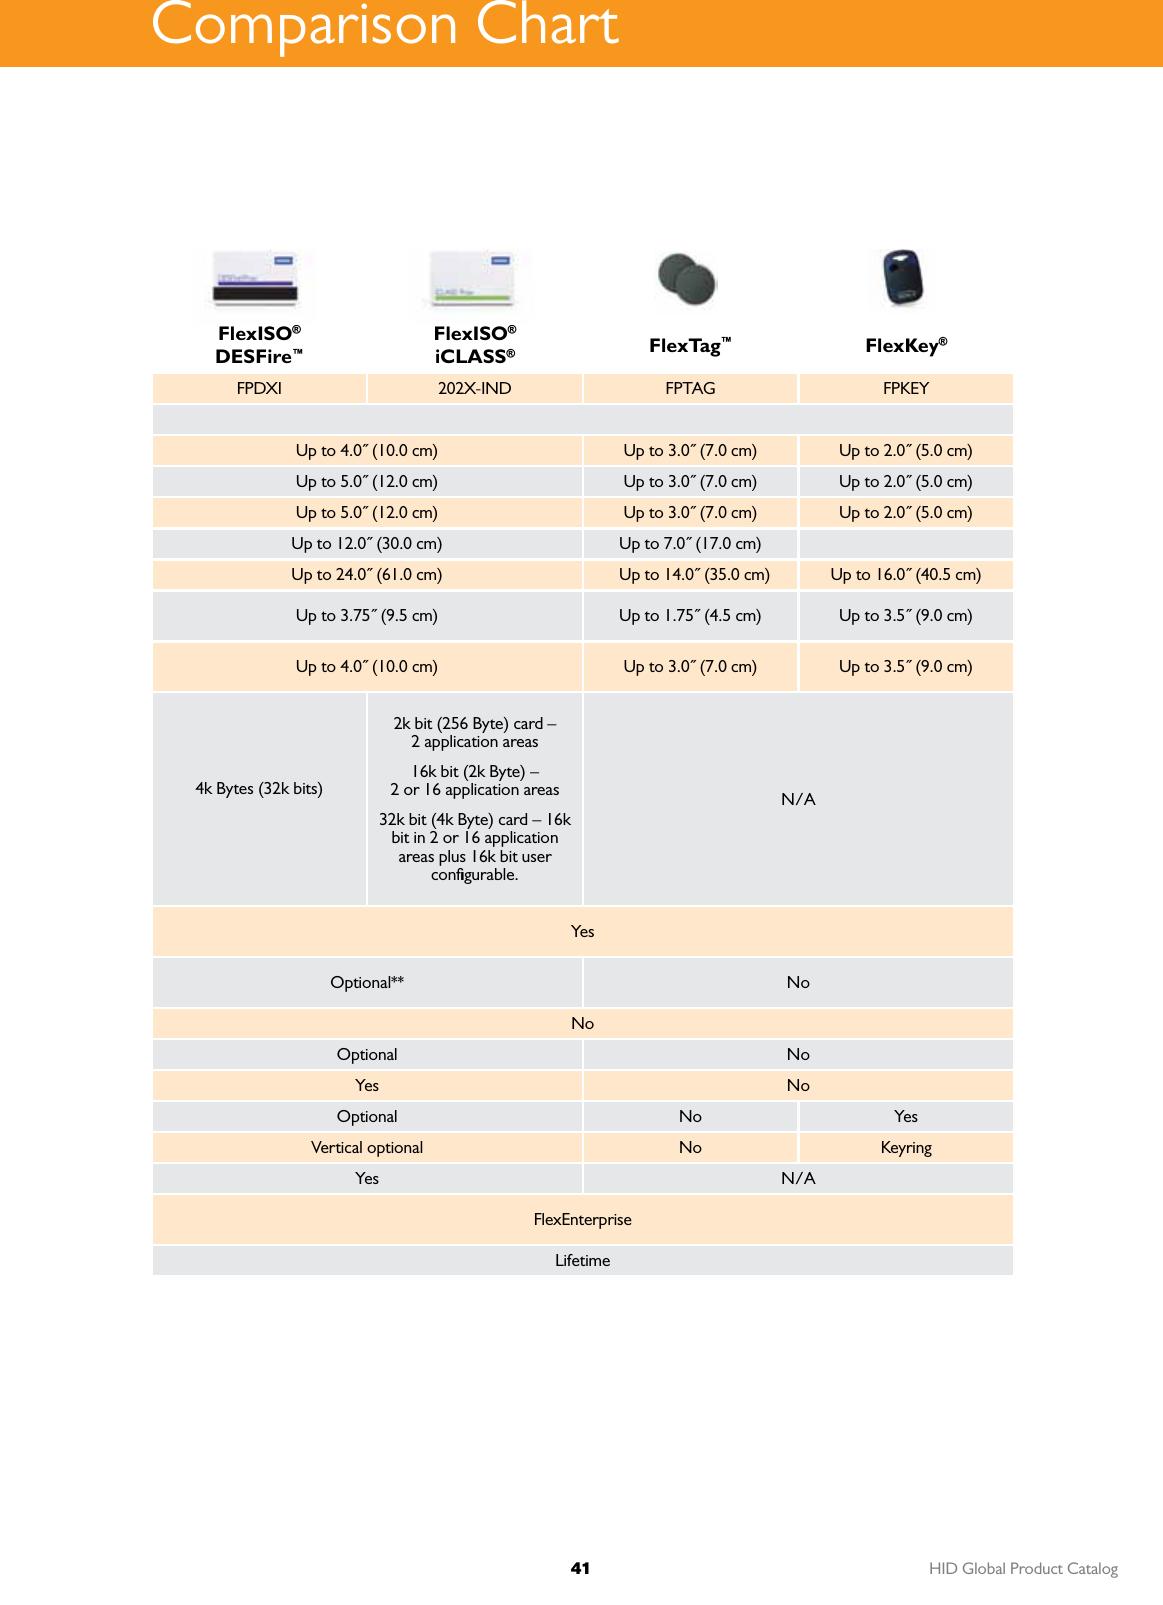 HID Product Catalog Hidcatalog